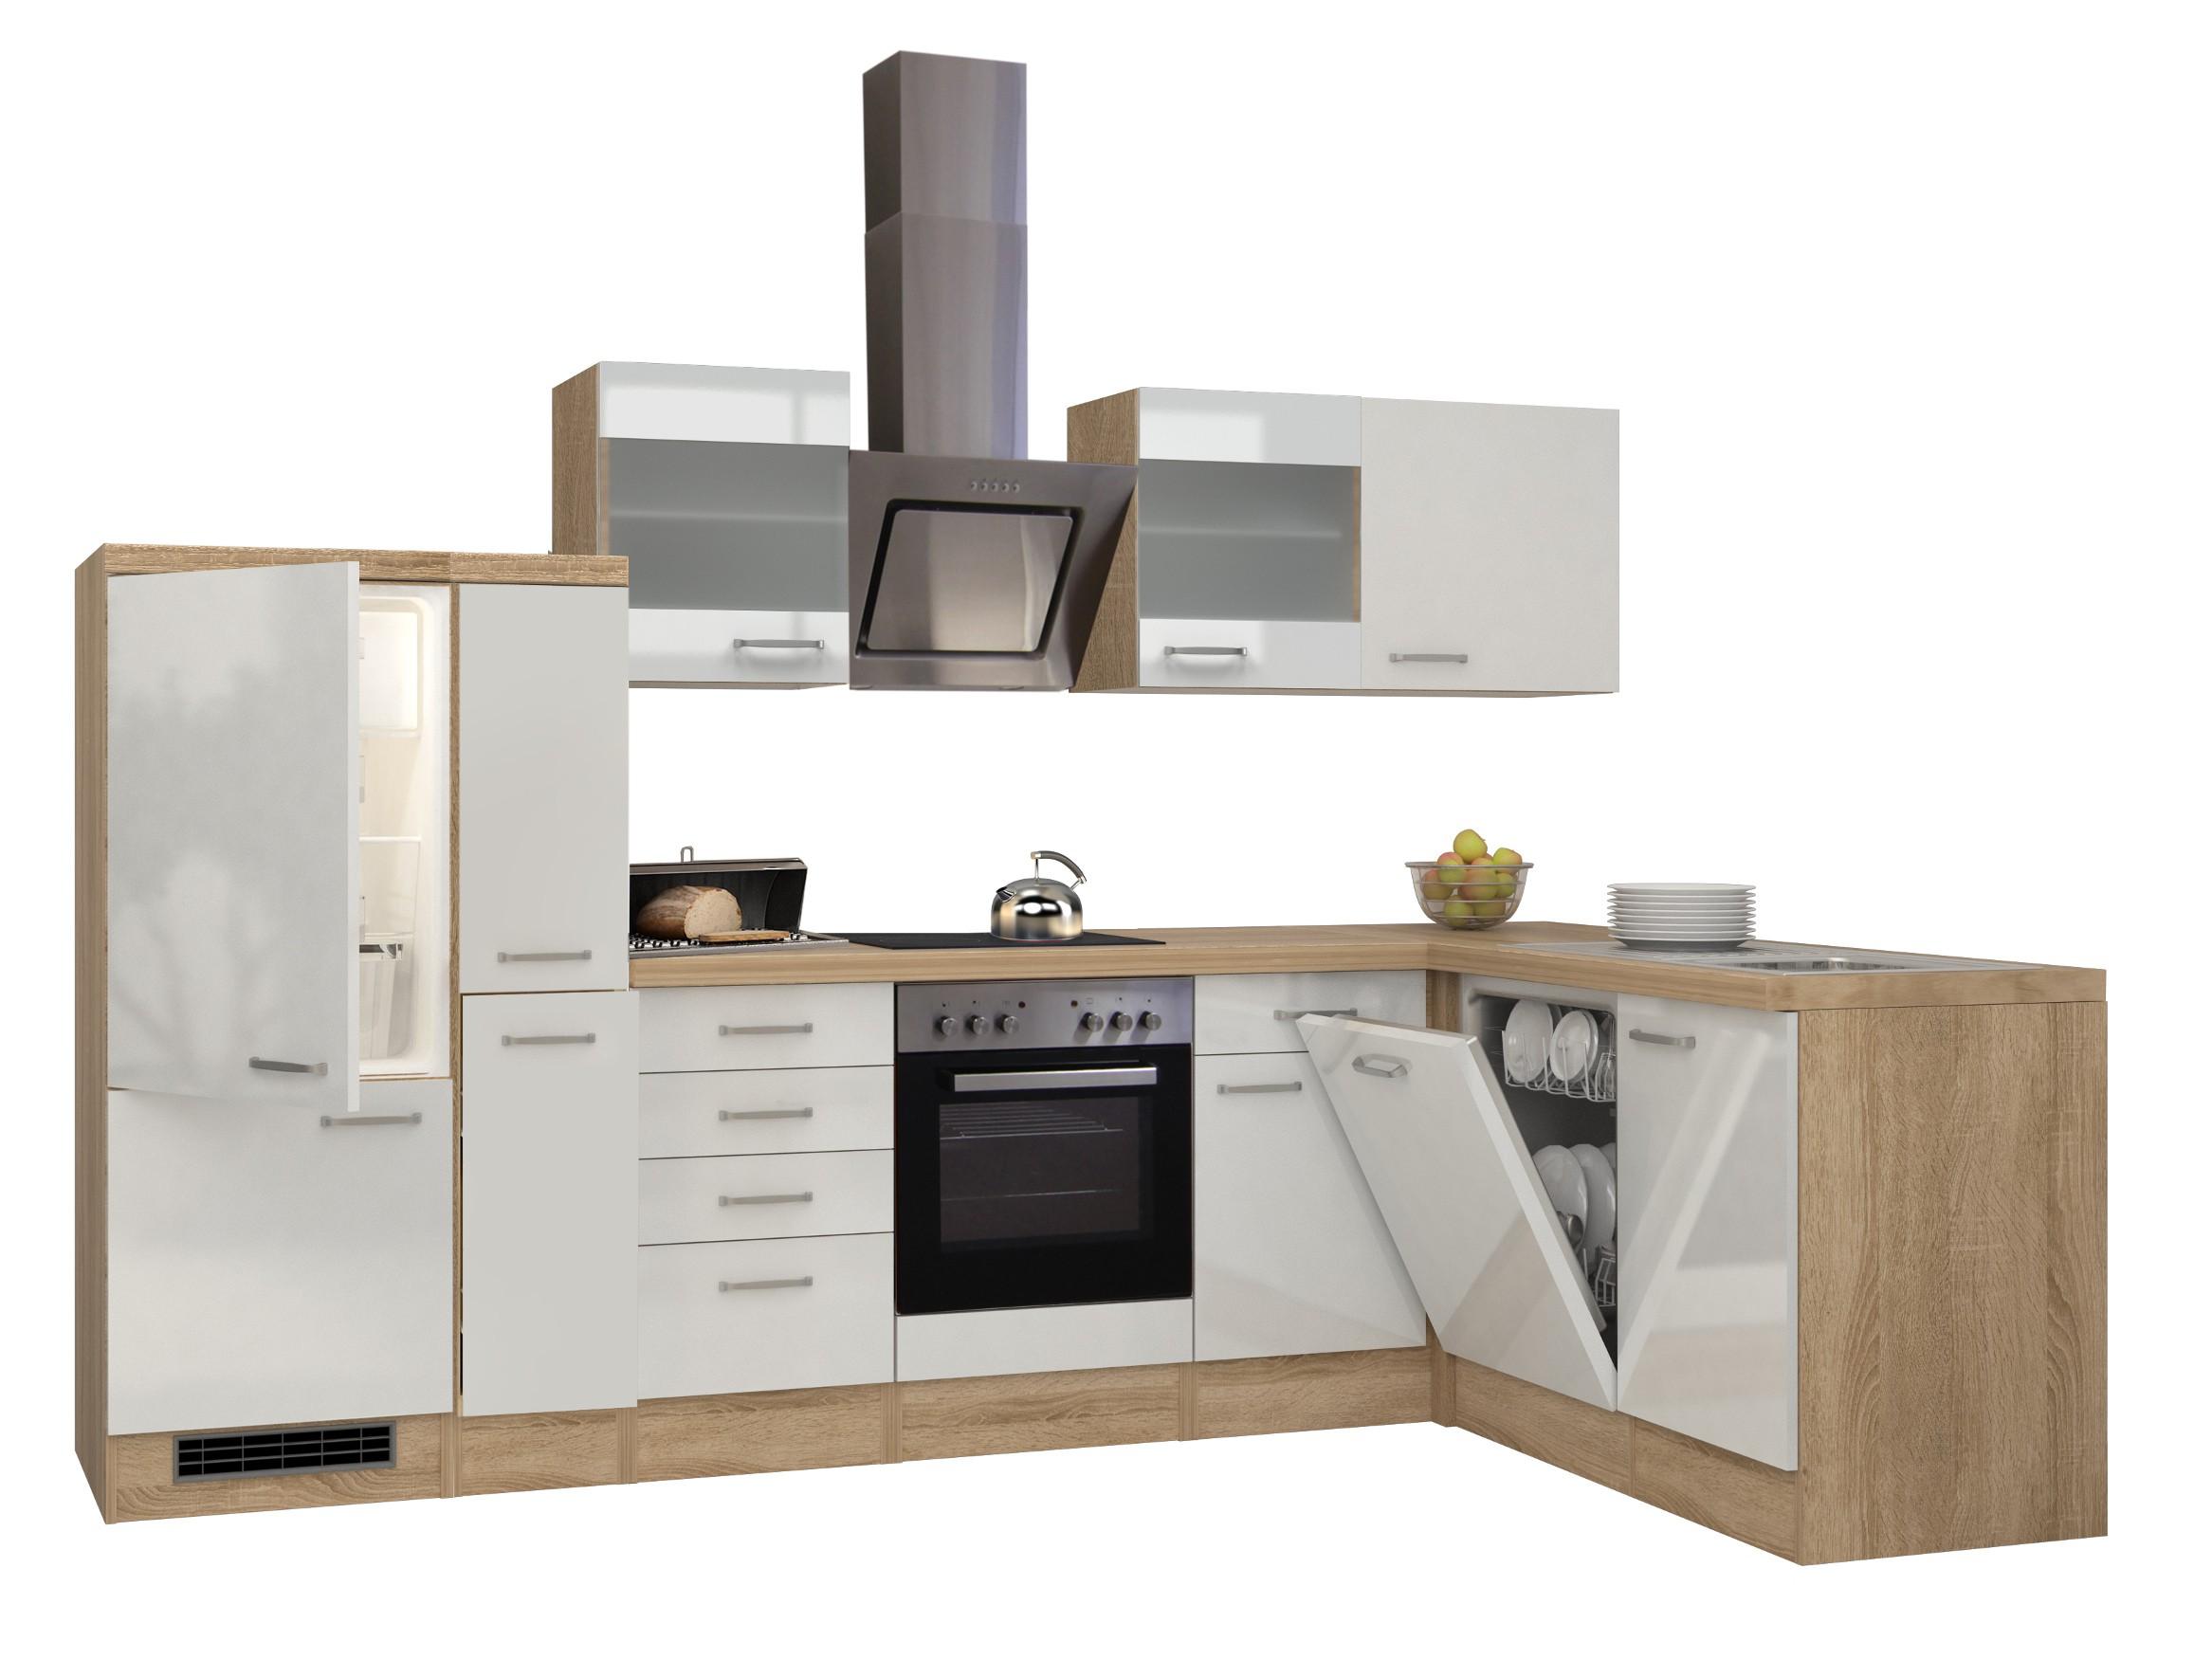 Full Size of Einbauküche L Form Günstig Einbauküche L Form Mit Geräten Einbauküche L Form Gebraucht Einbauküche L Form Kaufen Küche Einbauküche L Form